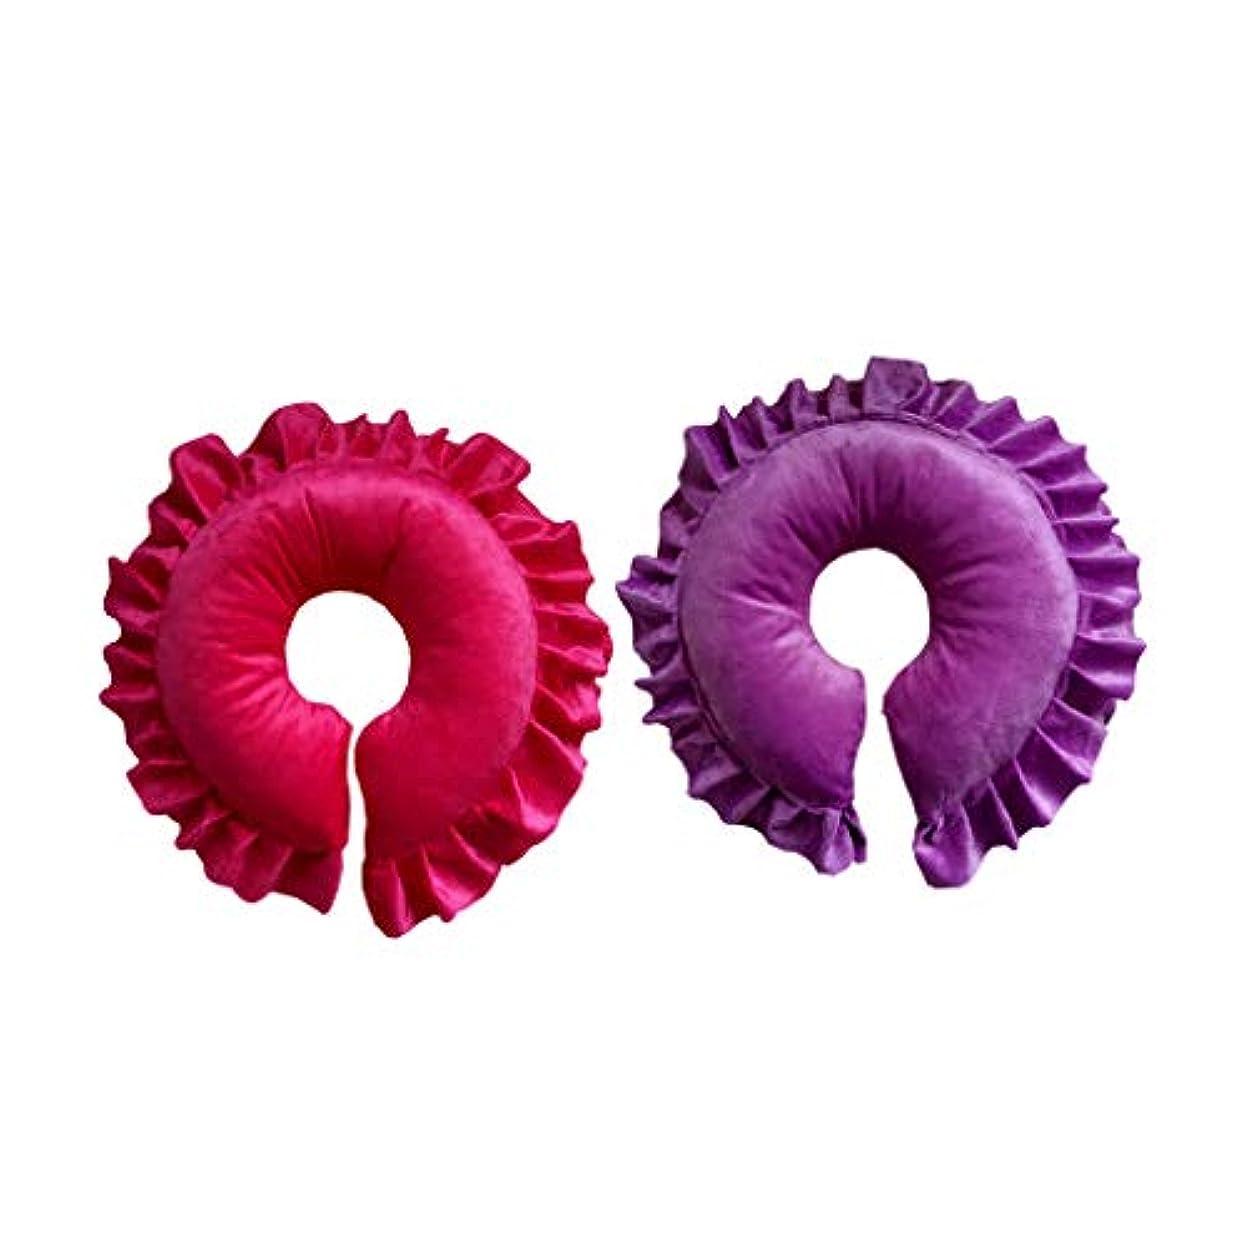 chiwanji フェイスピロー マッサージ枕 クッション サロン スパ 快適 実用的 紫&赤 2個入り